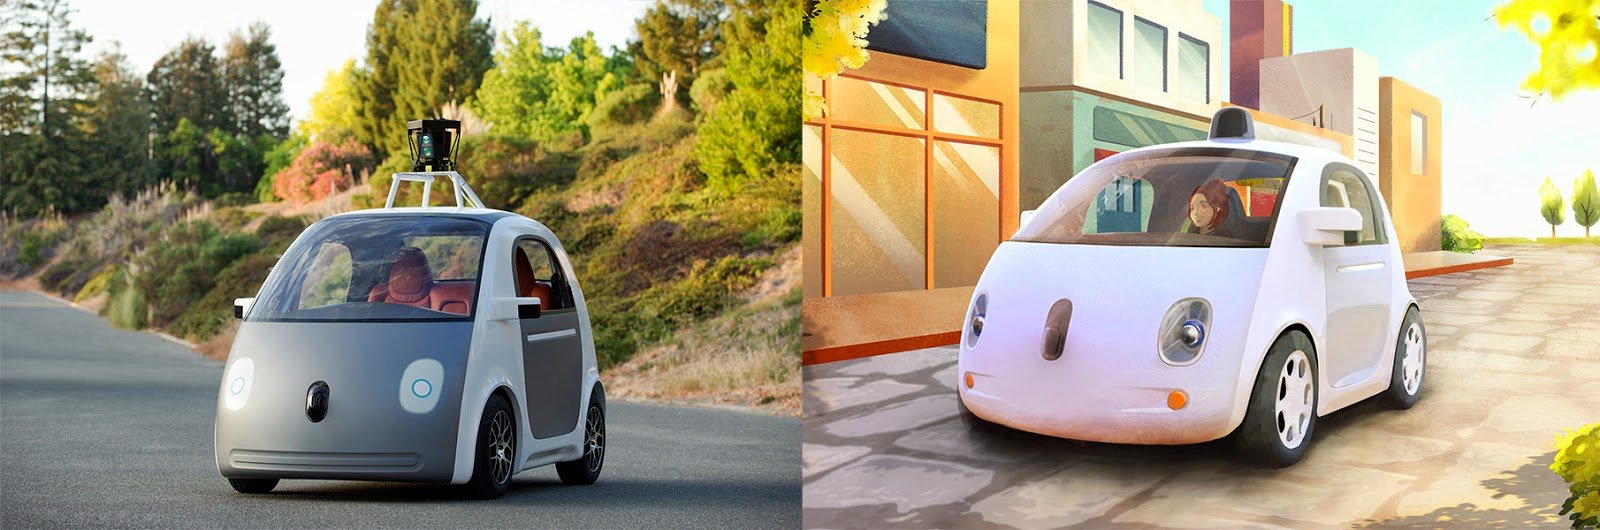 google auto prototipo